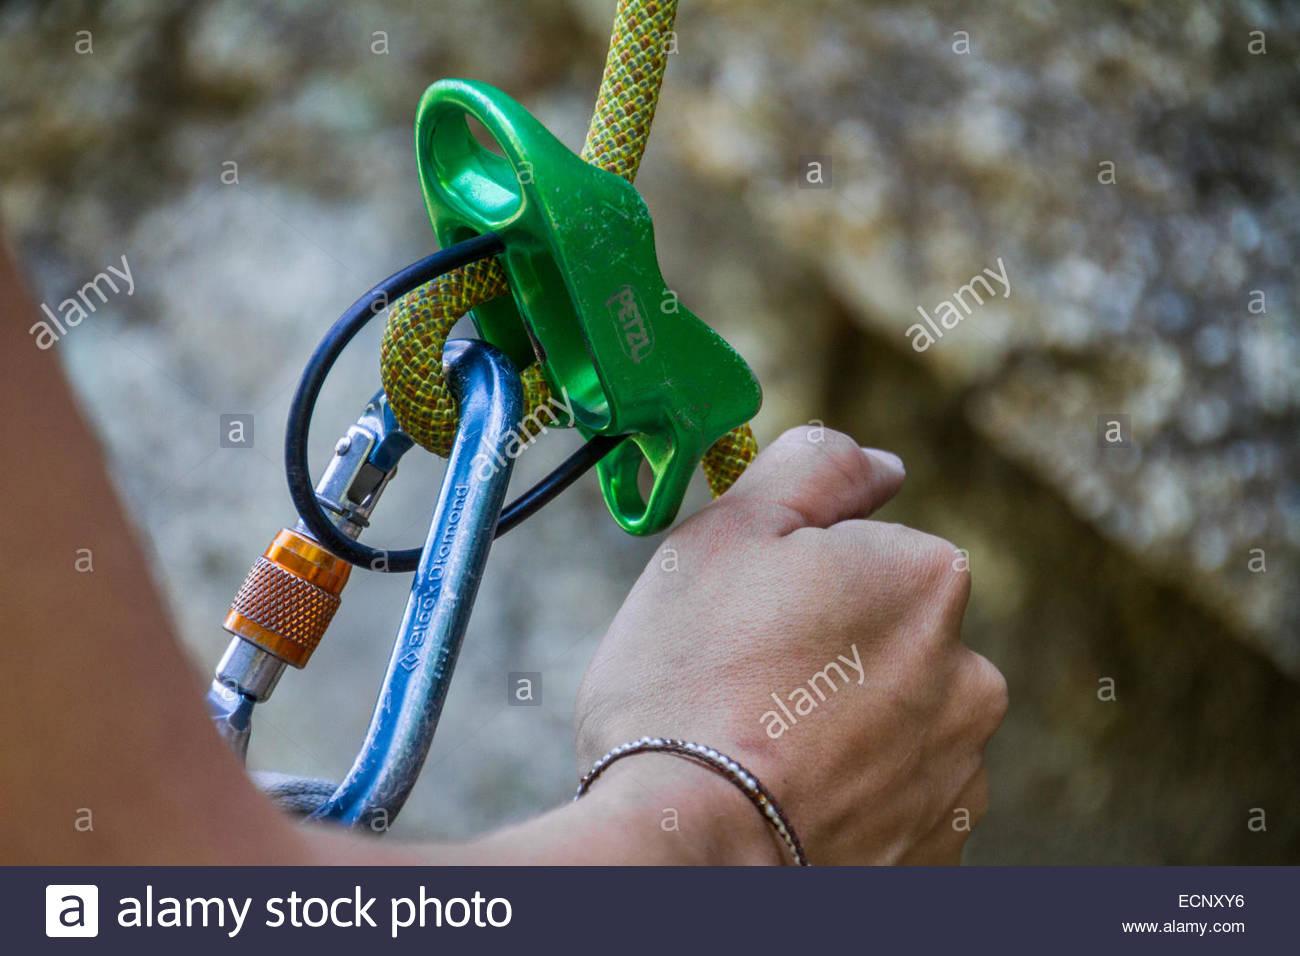 Close-up of woman's hand adjusting climbing harness - USA - Colorado - Stock Image